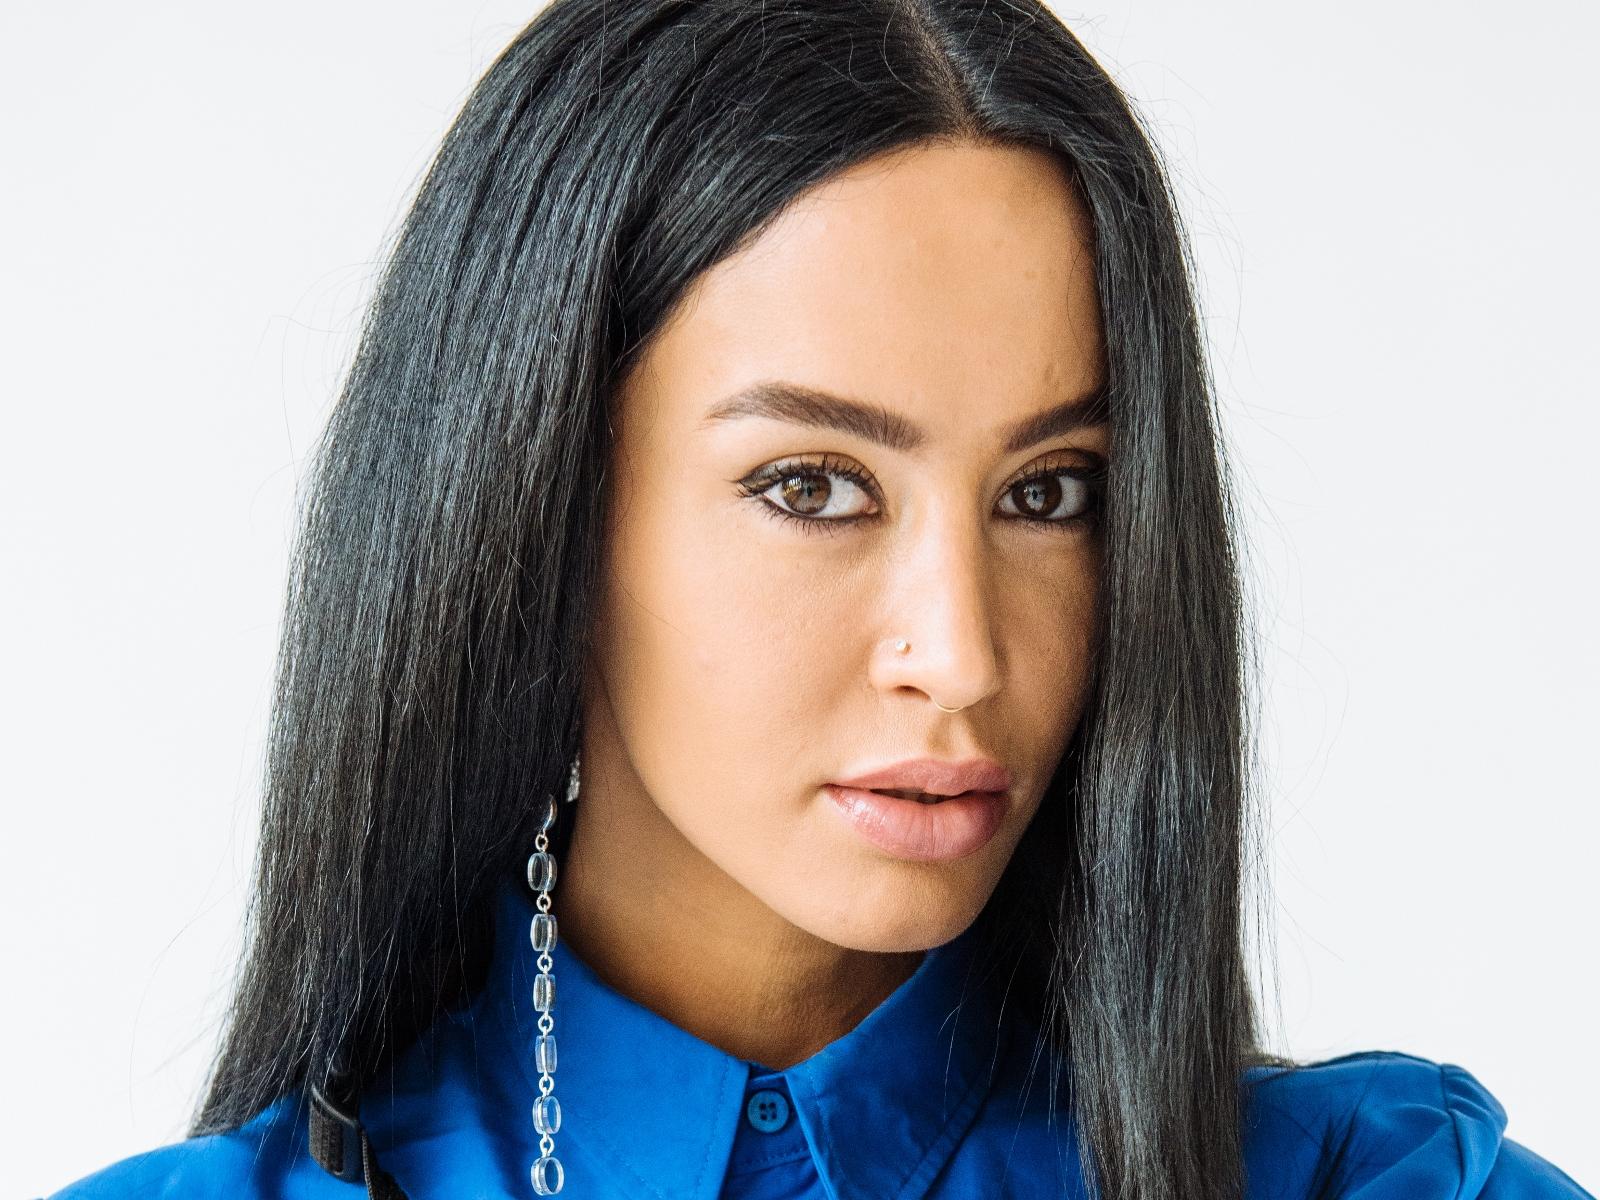 Dafina Zeqiri face close up large